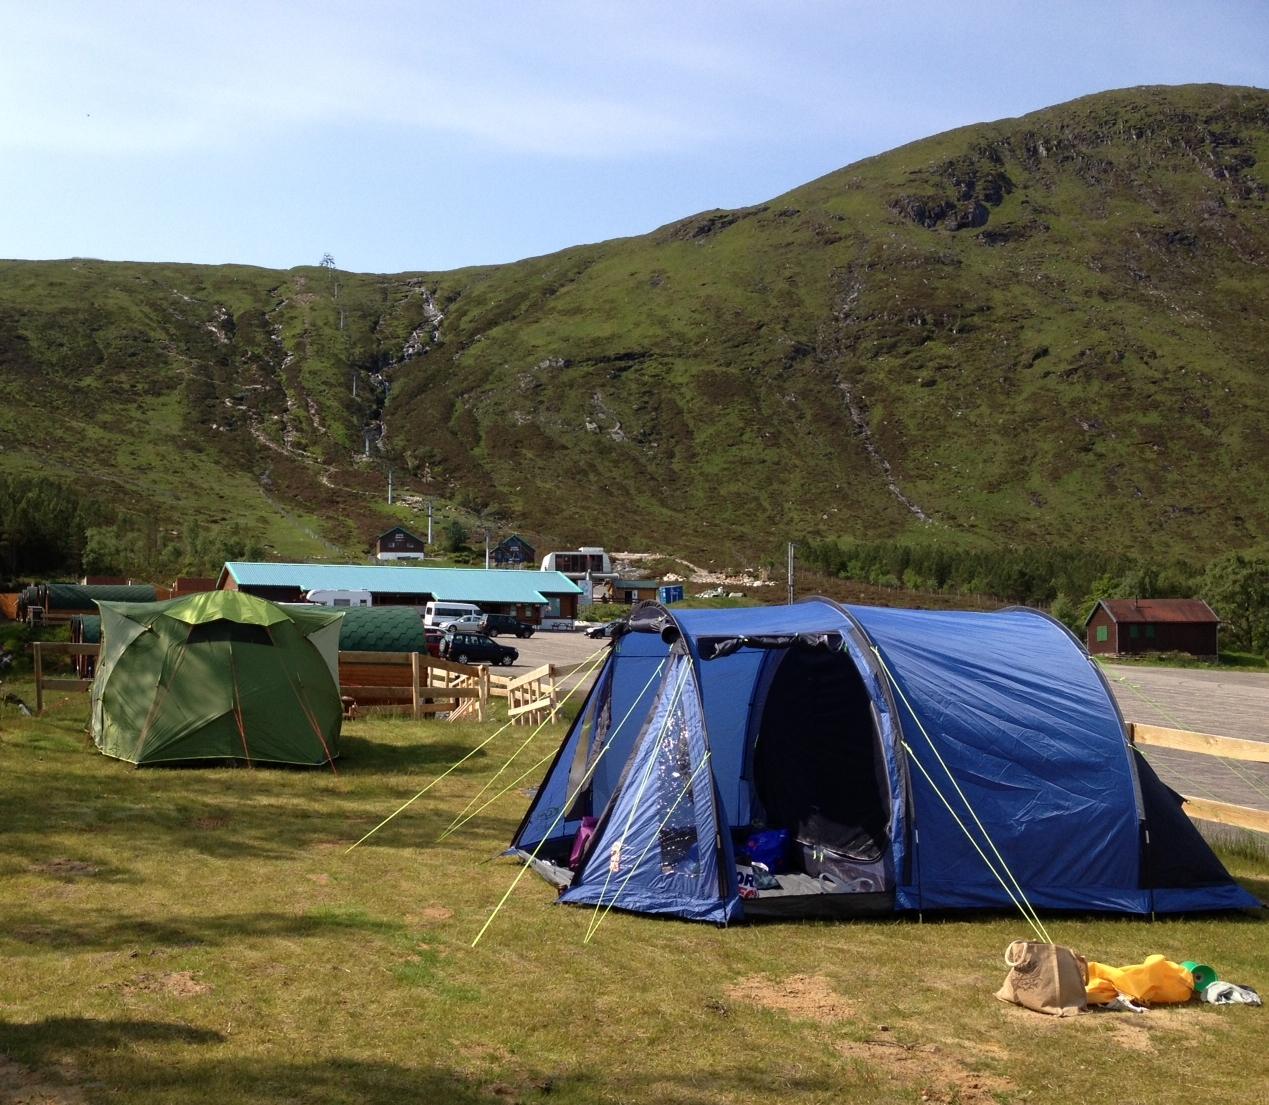 Year round Scottish camping at Glencoe Mountain Resort